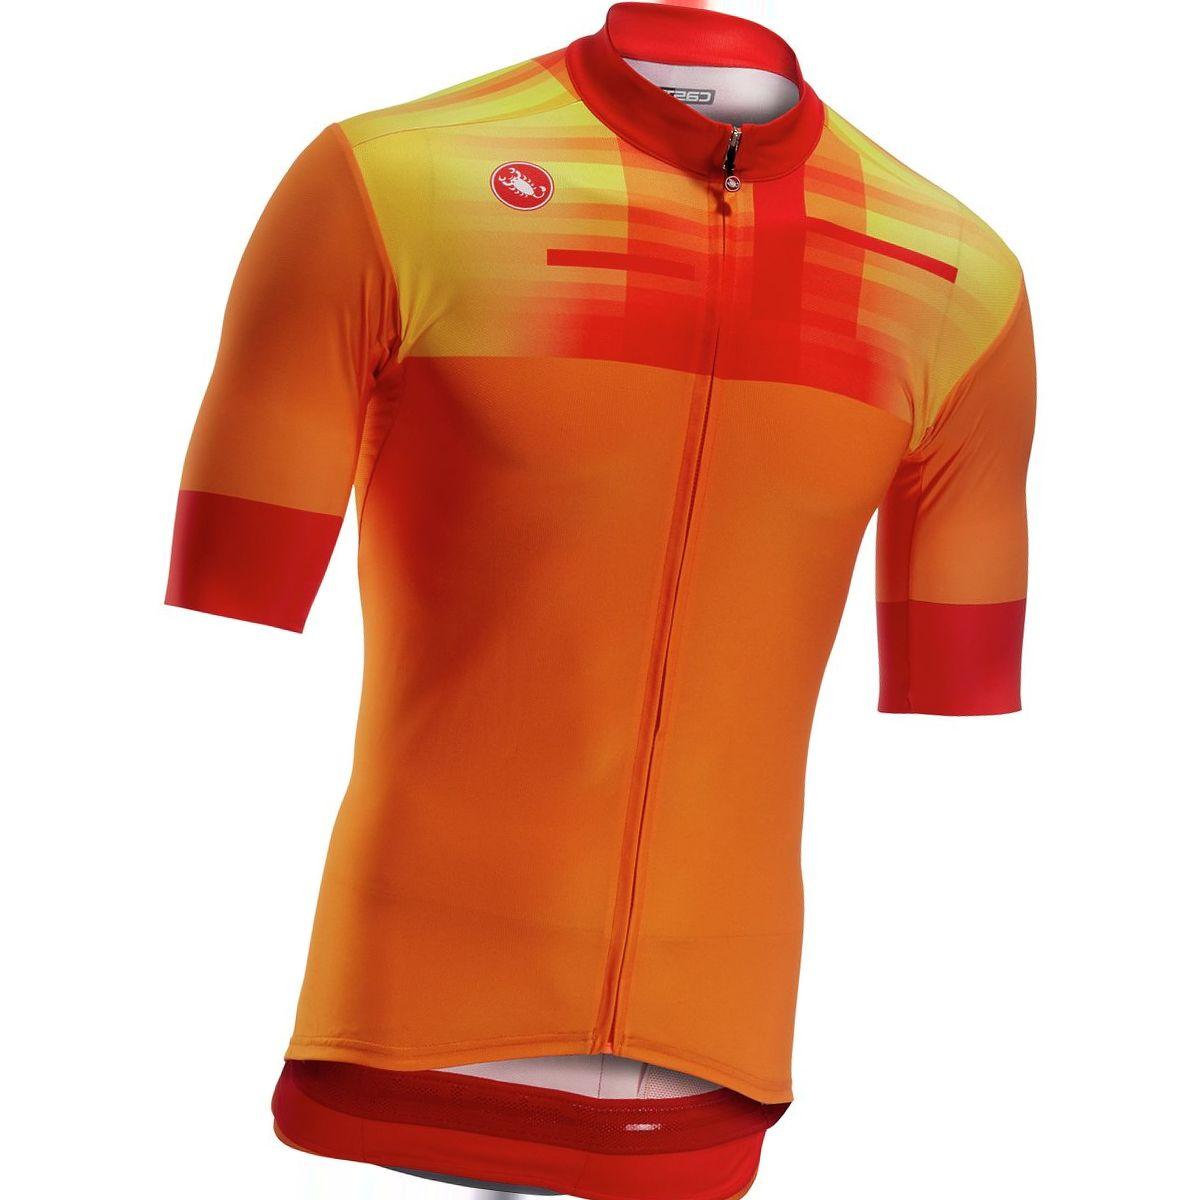 Castelli A Bloc Full-Zip Jersey - Men's